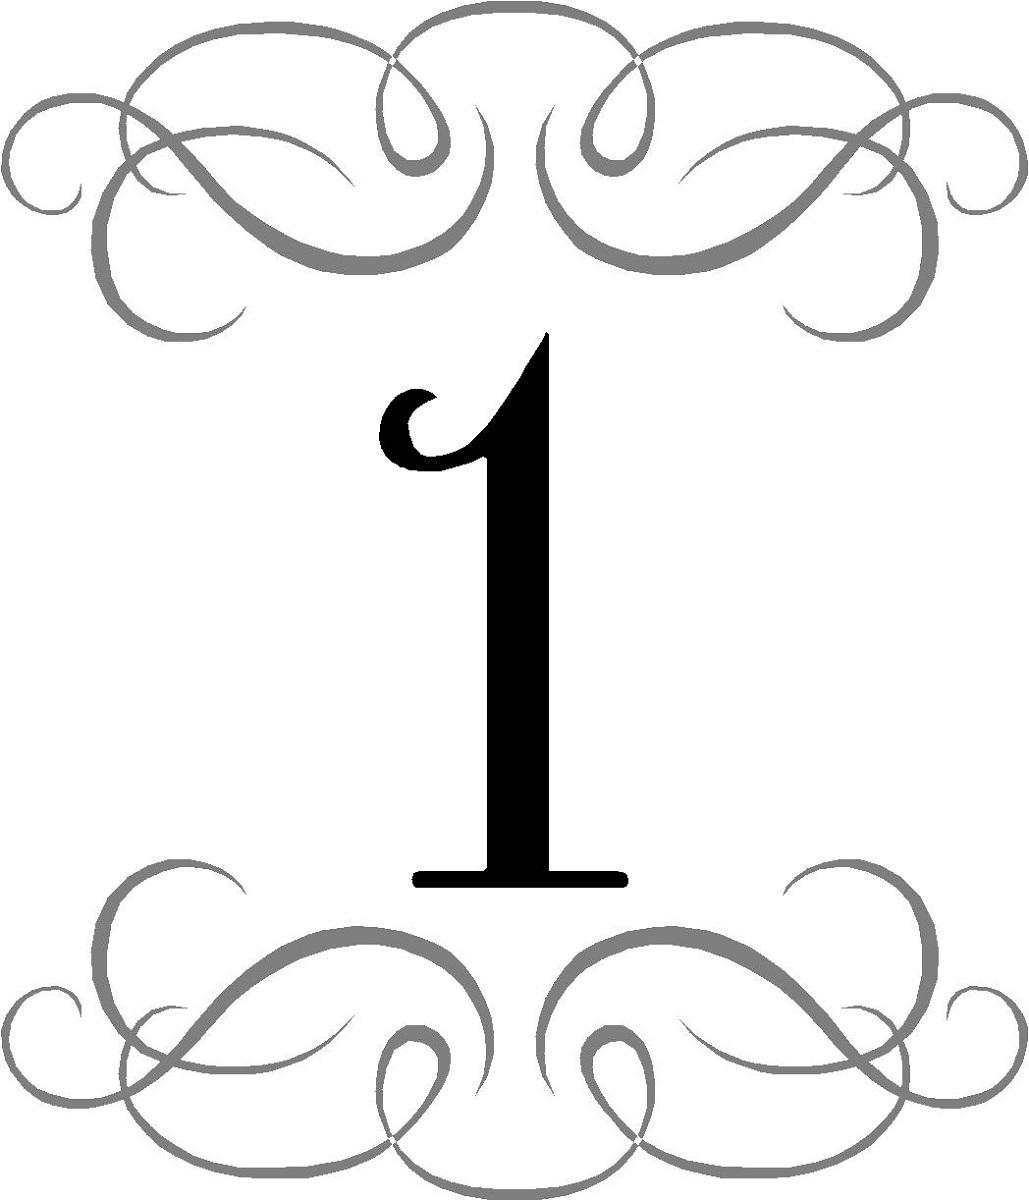 number 1 picture design